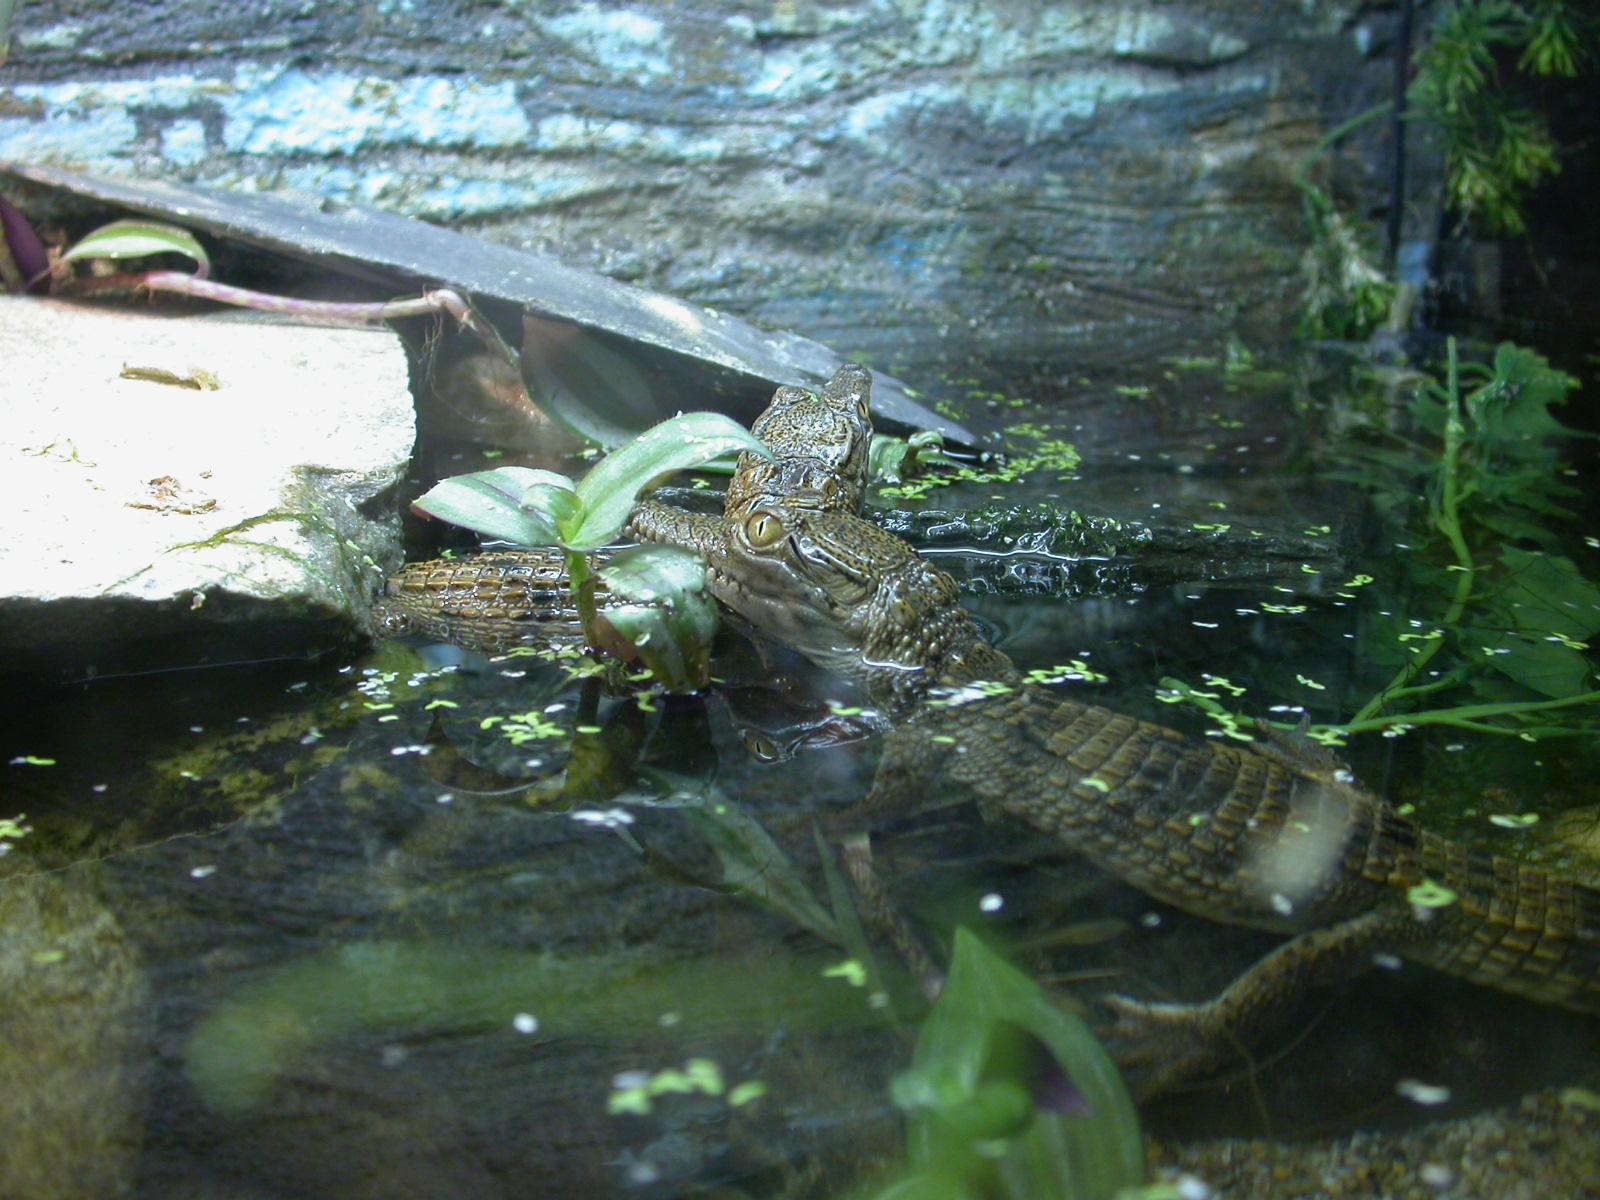 eva zoo baby crocodiles alligators crocodile alligator water reptiles young